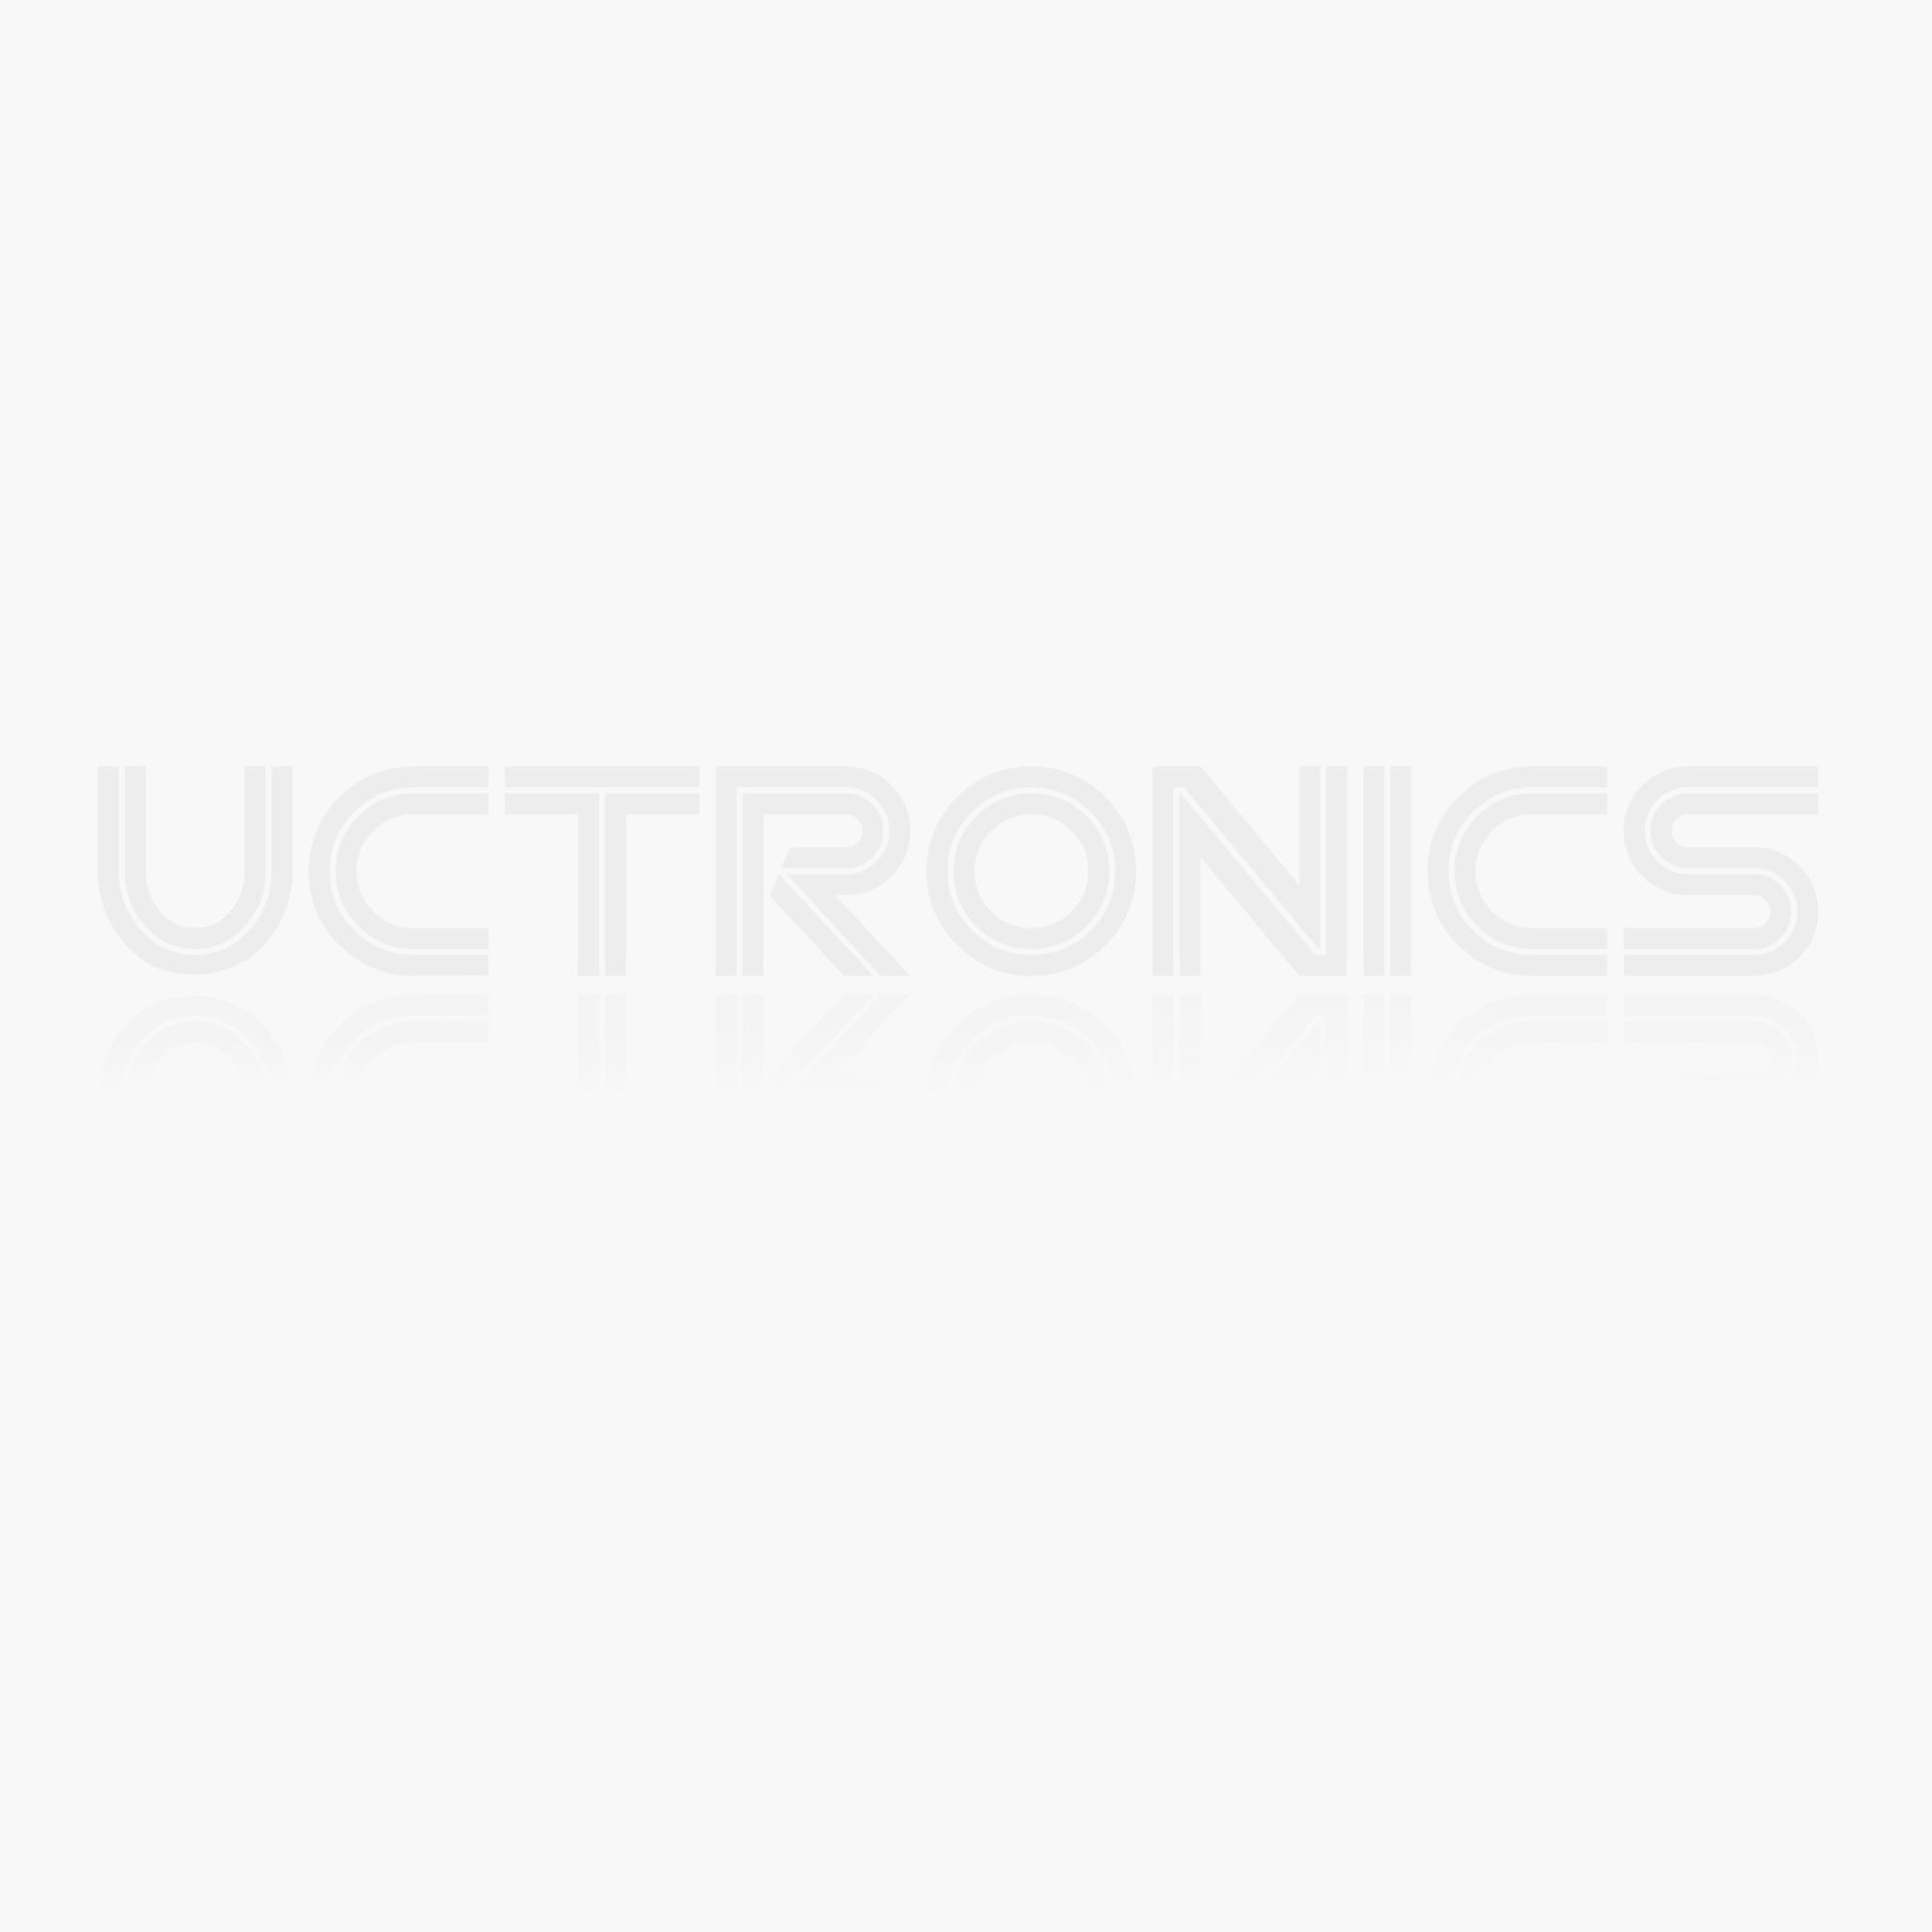 100pcs TO-220 Silicon Rubber Pad for Insulation Silicon Heatsink Silicon Sheet